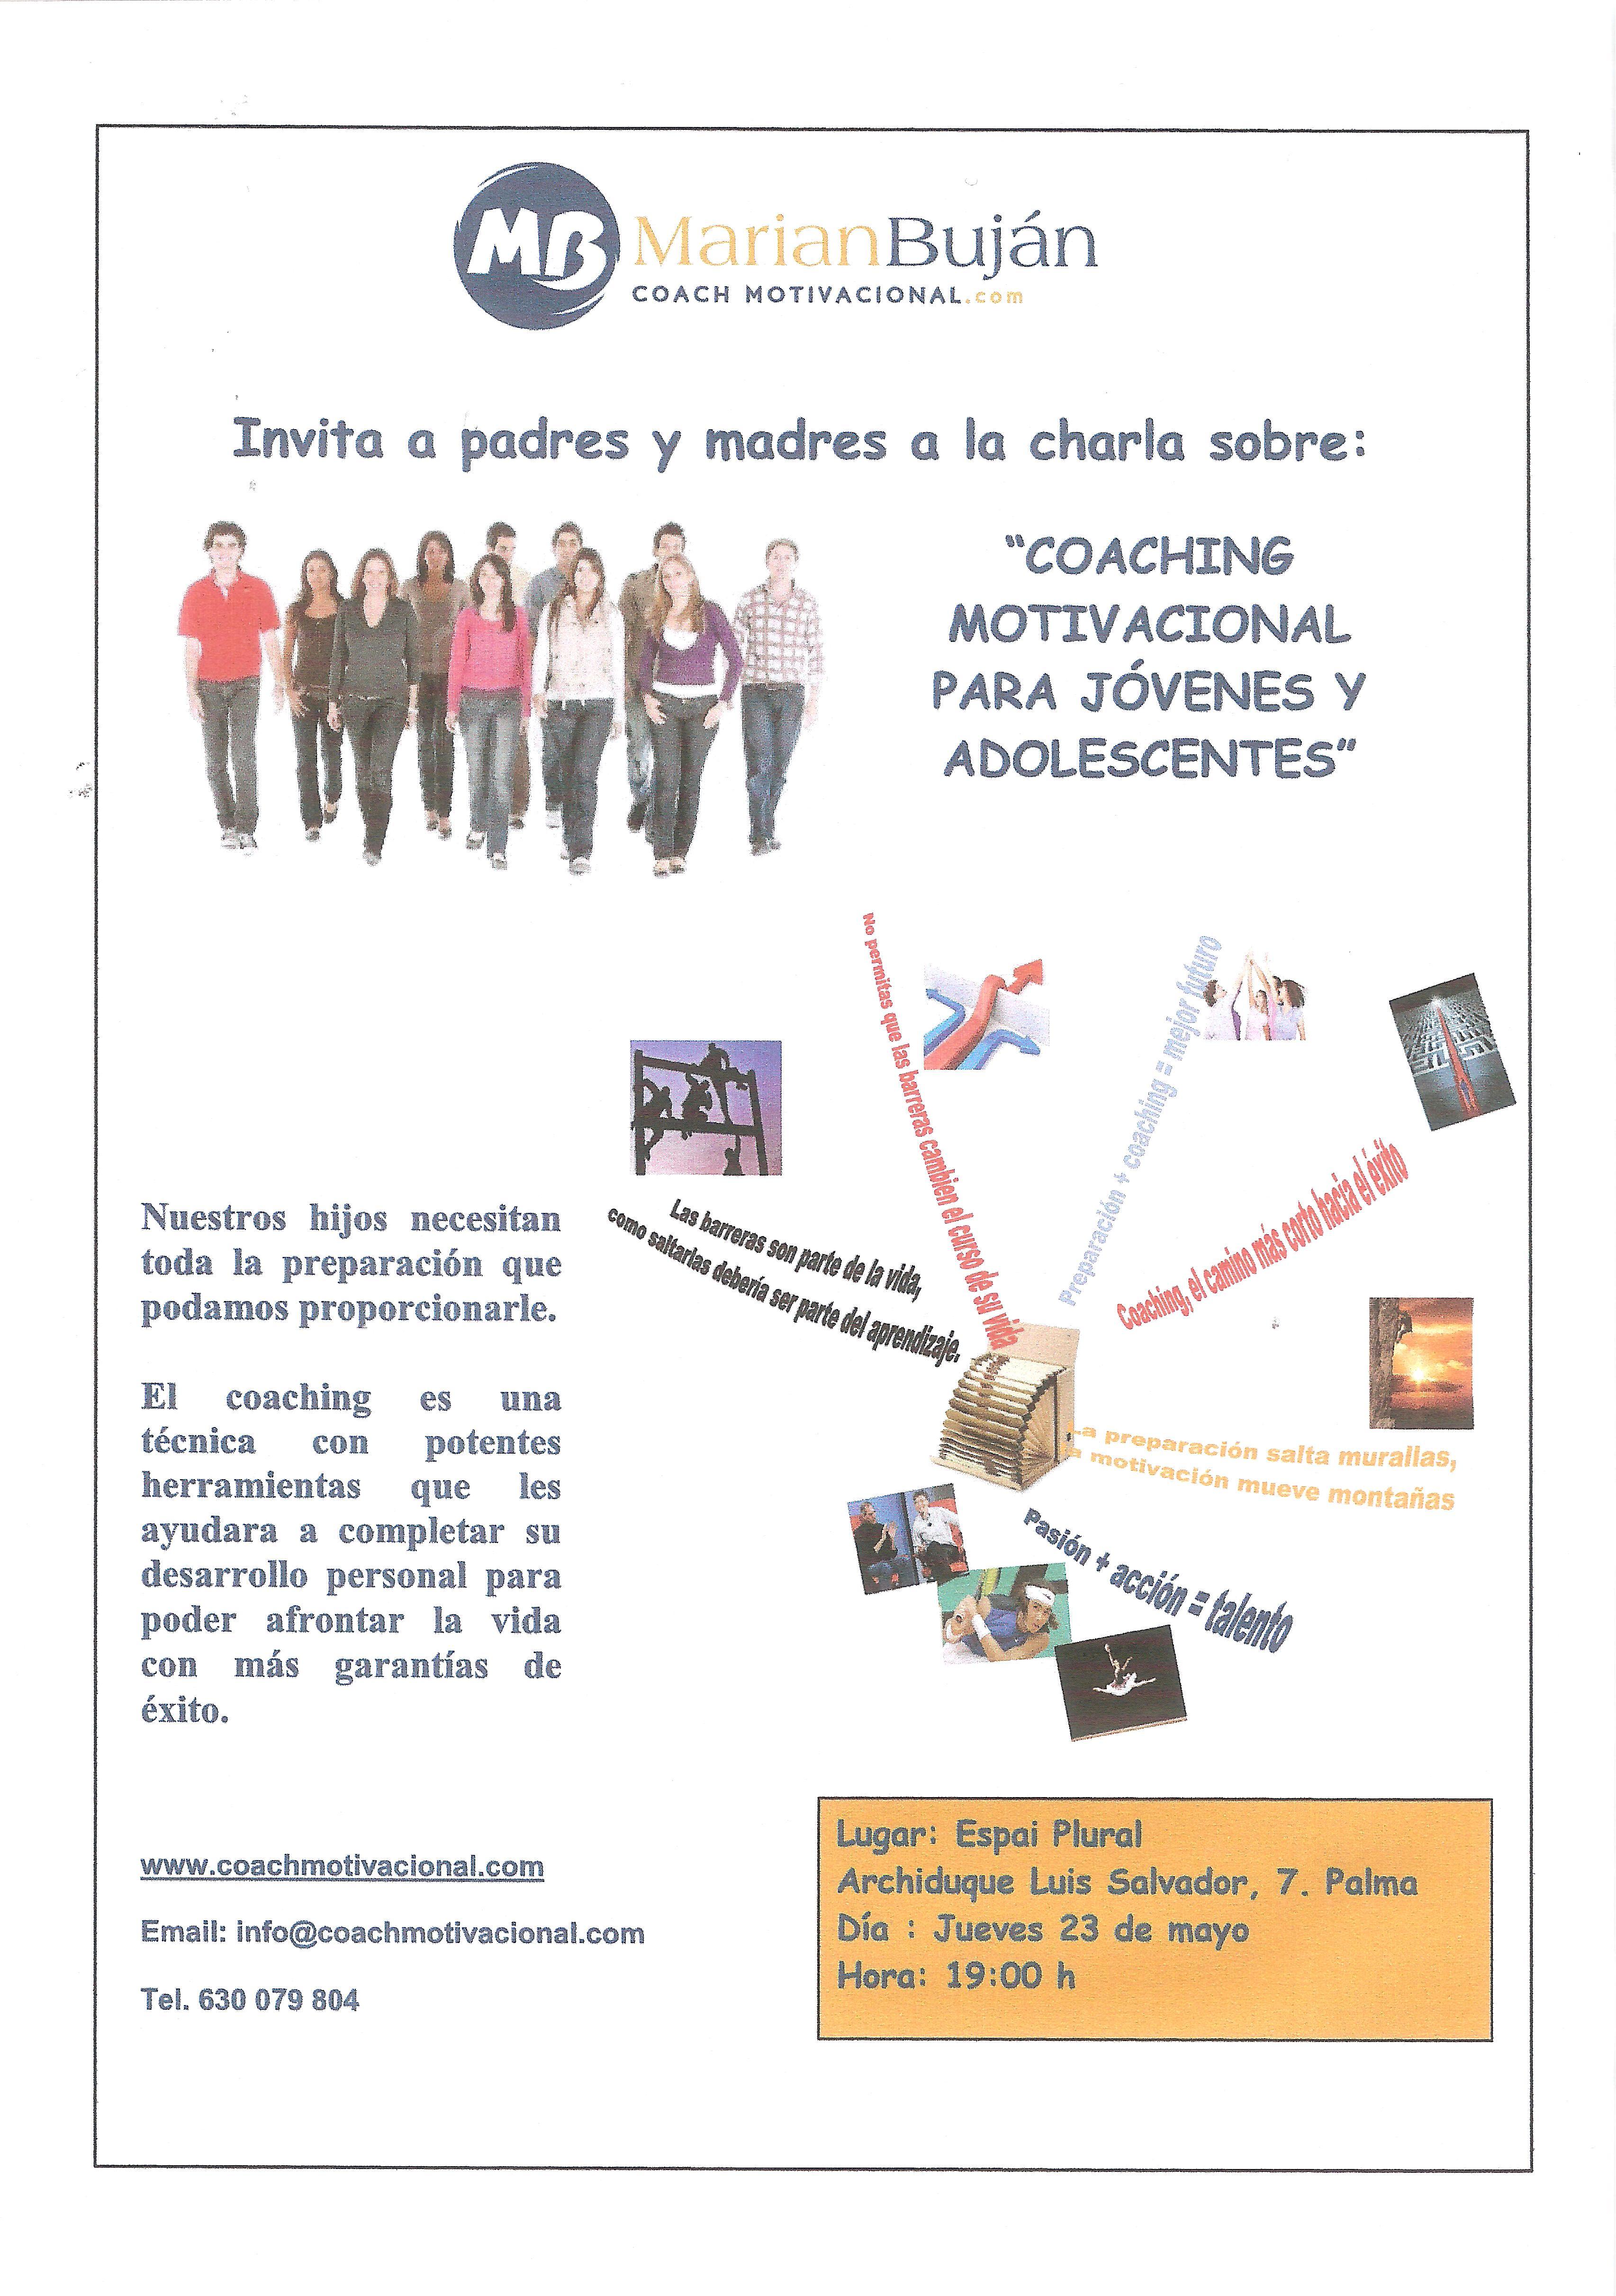 Coaching Motivacional Para Jóvenes Charla Orientada A